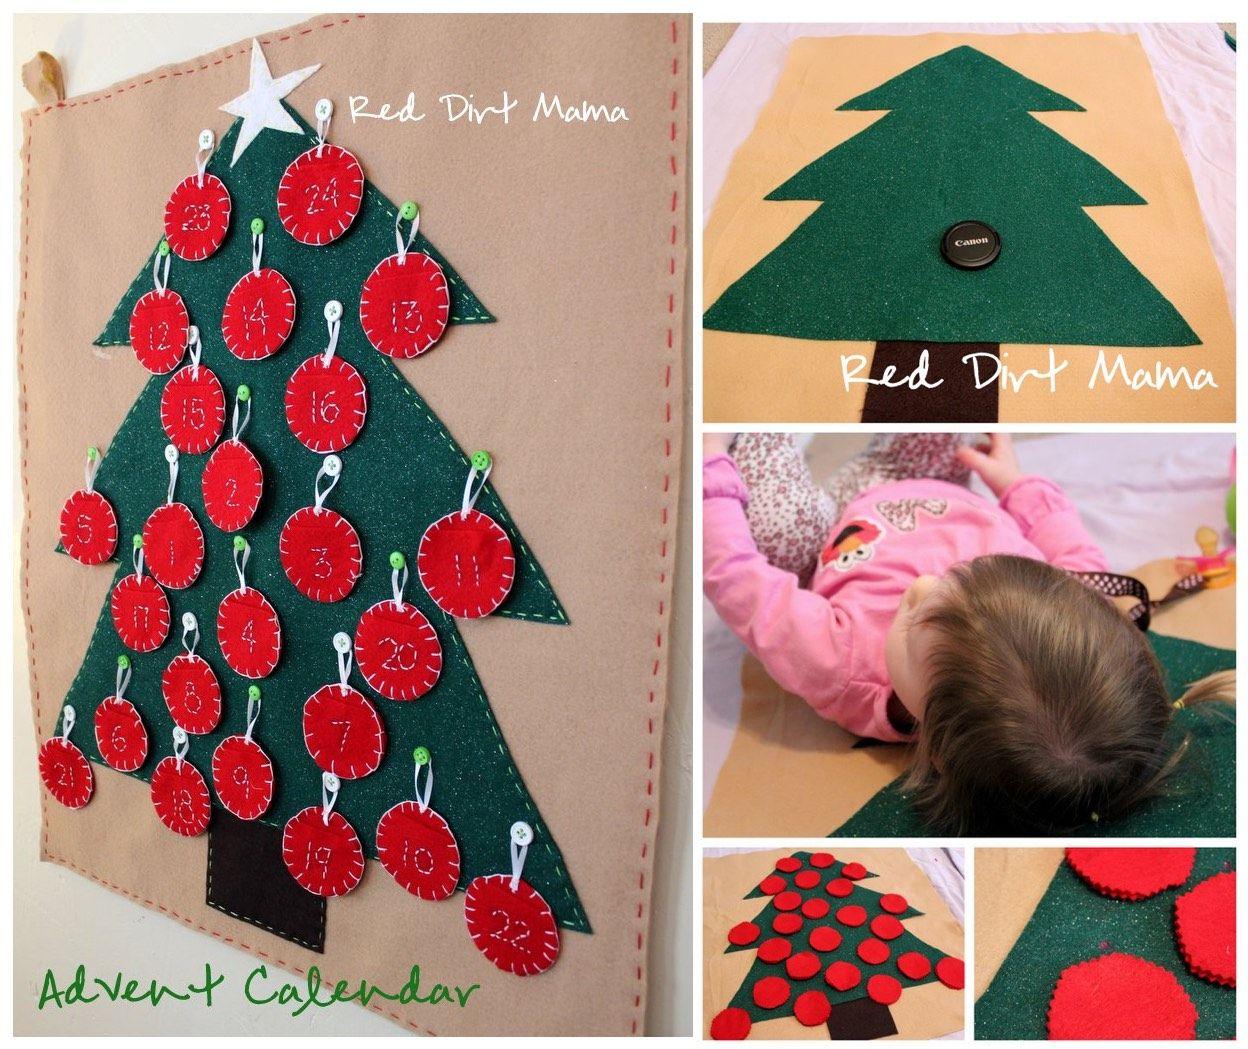 Top 15 ideas for the best diy advent calendar for kids advent top 15 ideas for the best diy advent calendar for kids solutioingenieria Images